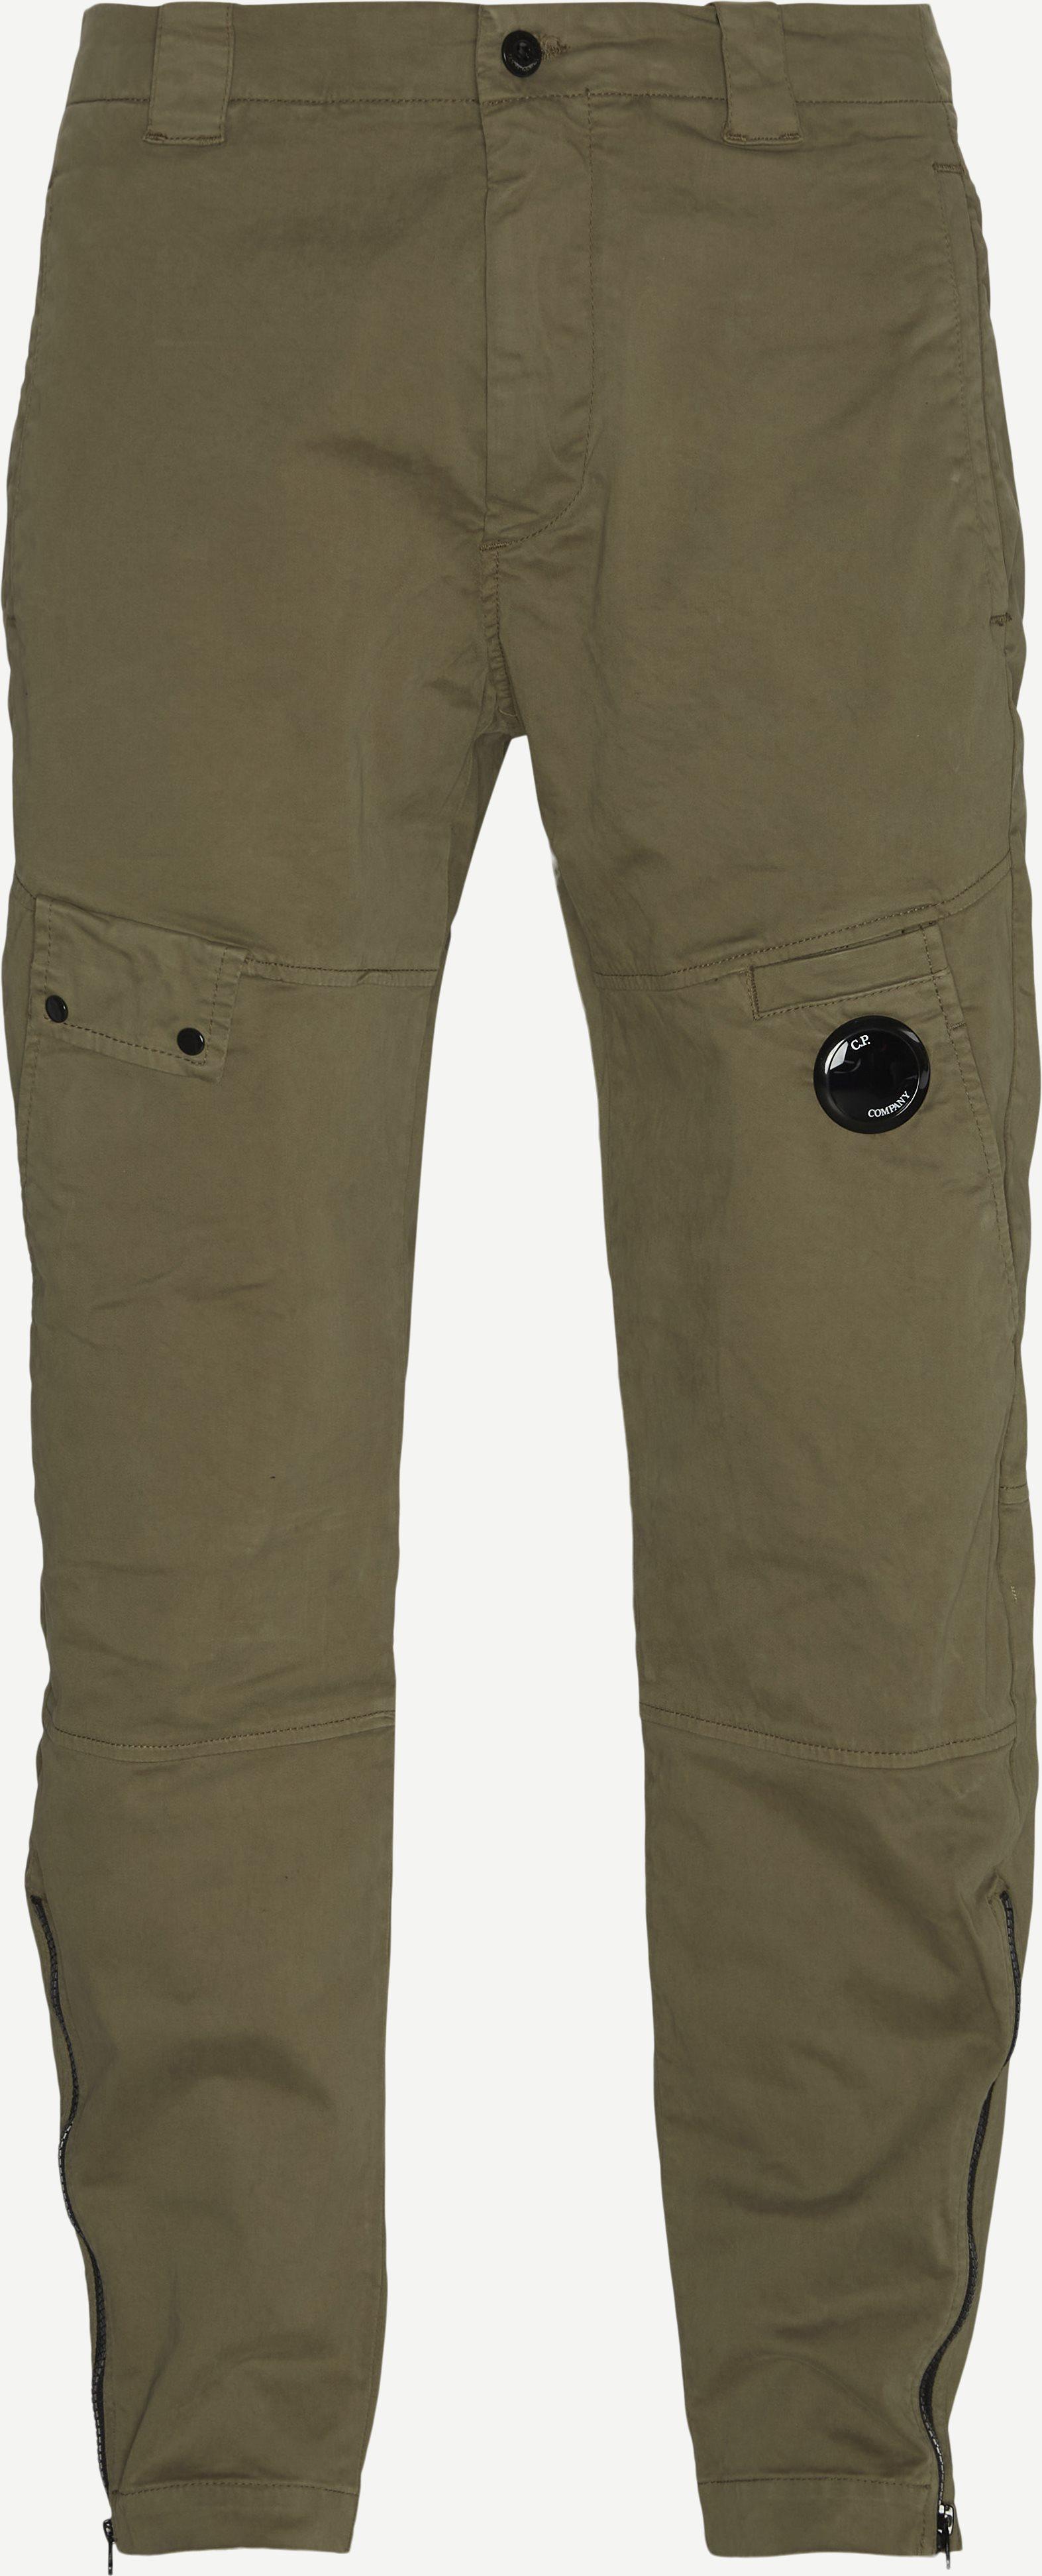 Garment Dyed Pants - Bukser - Regular fit - Army